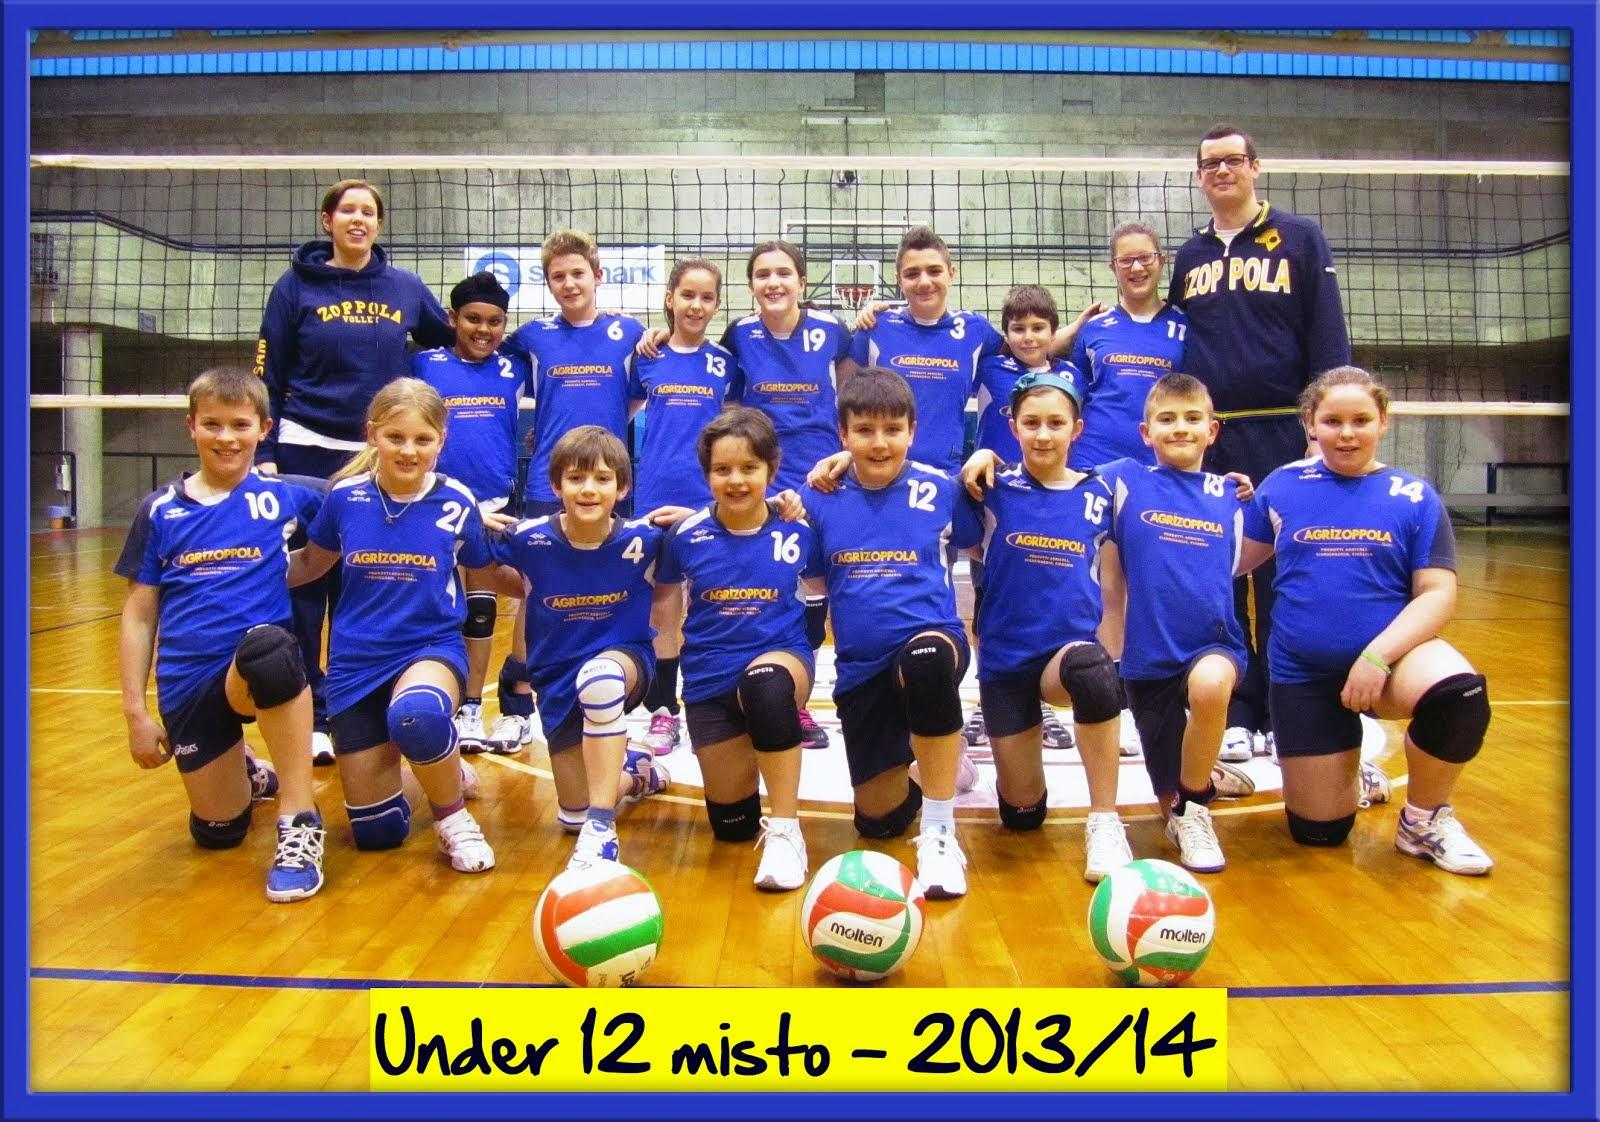 UNDER 12 MISTO - 2013/14